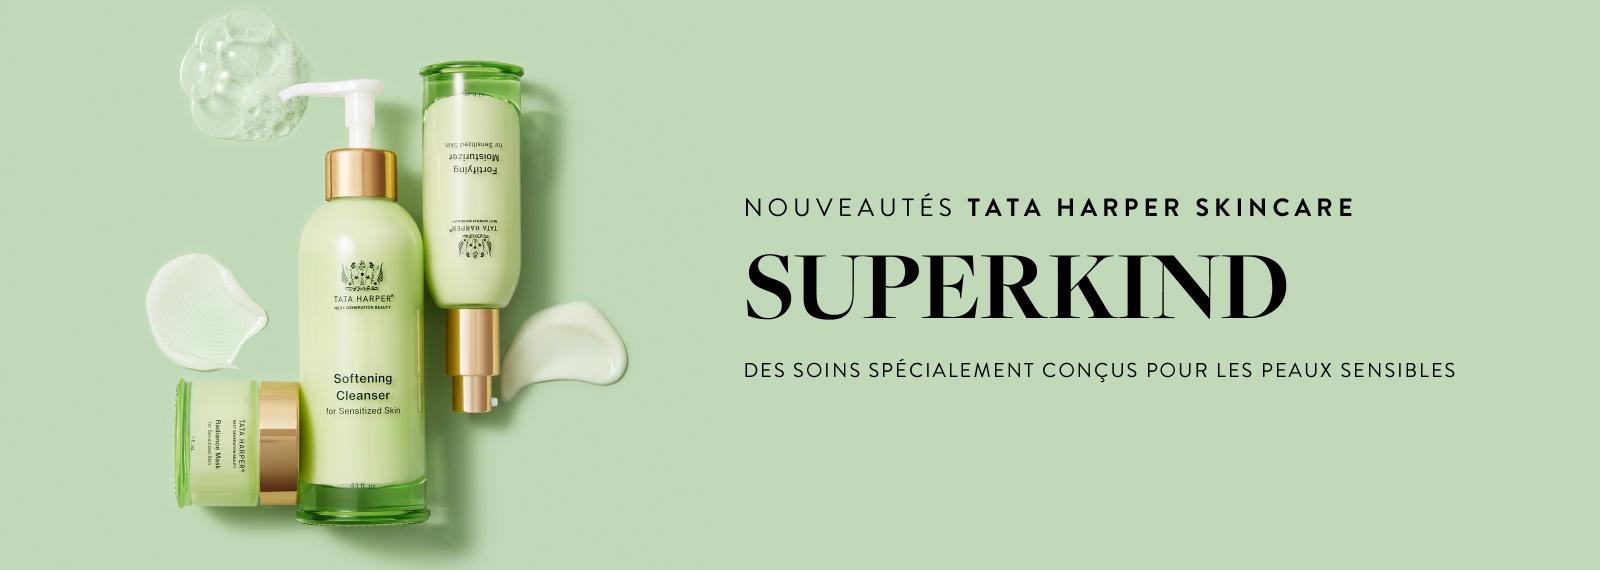 NOUVEAUTÉS TATA HARPER SKINCARE - SUPERKIND